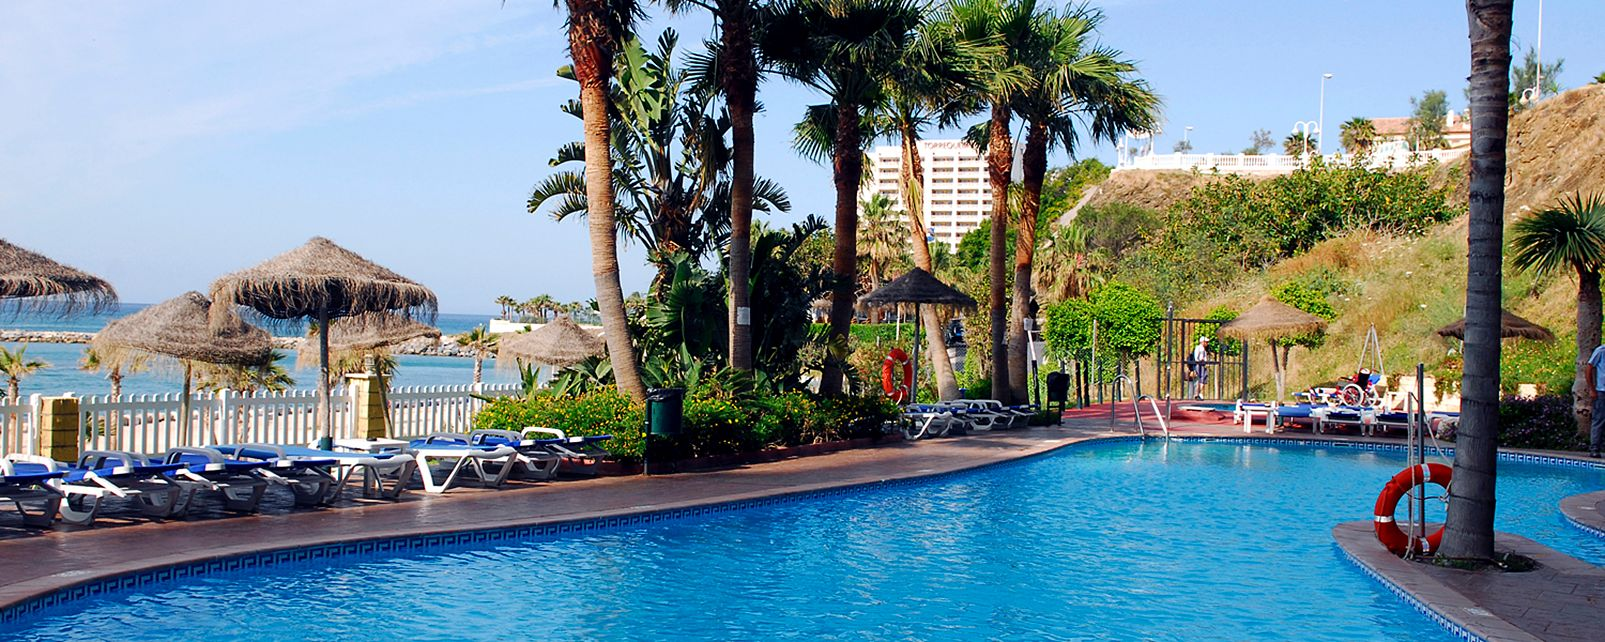 Benalmadena Hotel Best Siroco